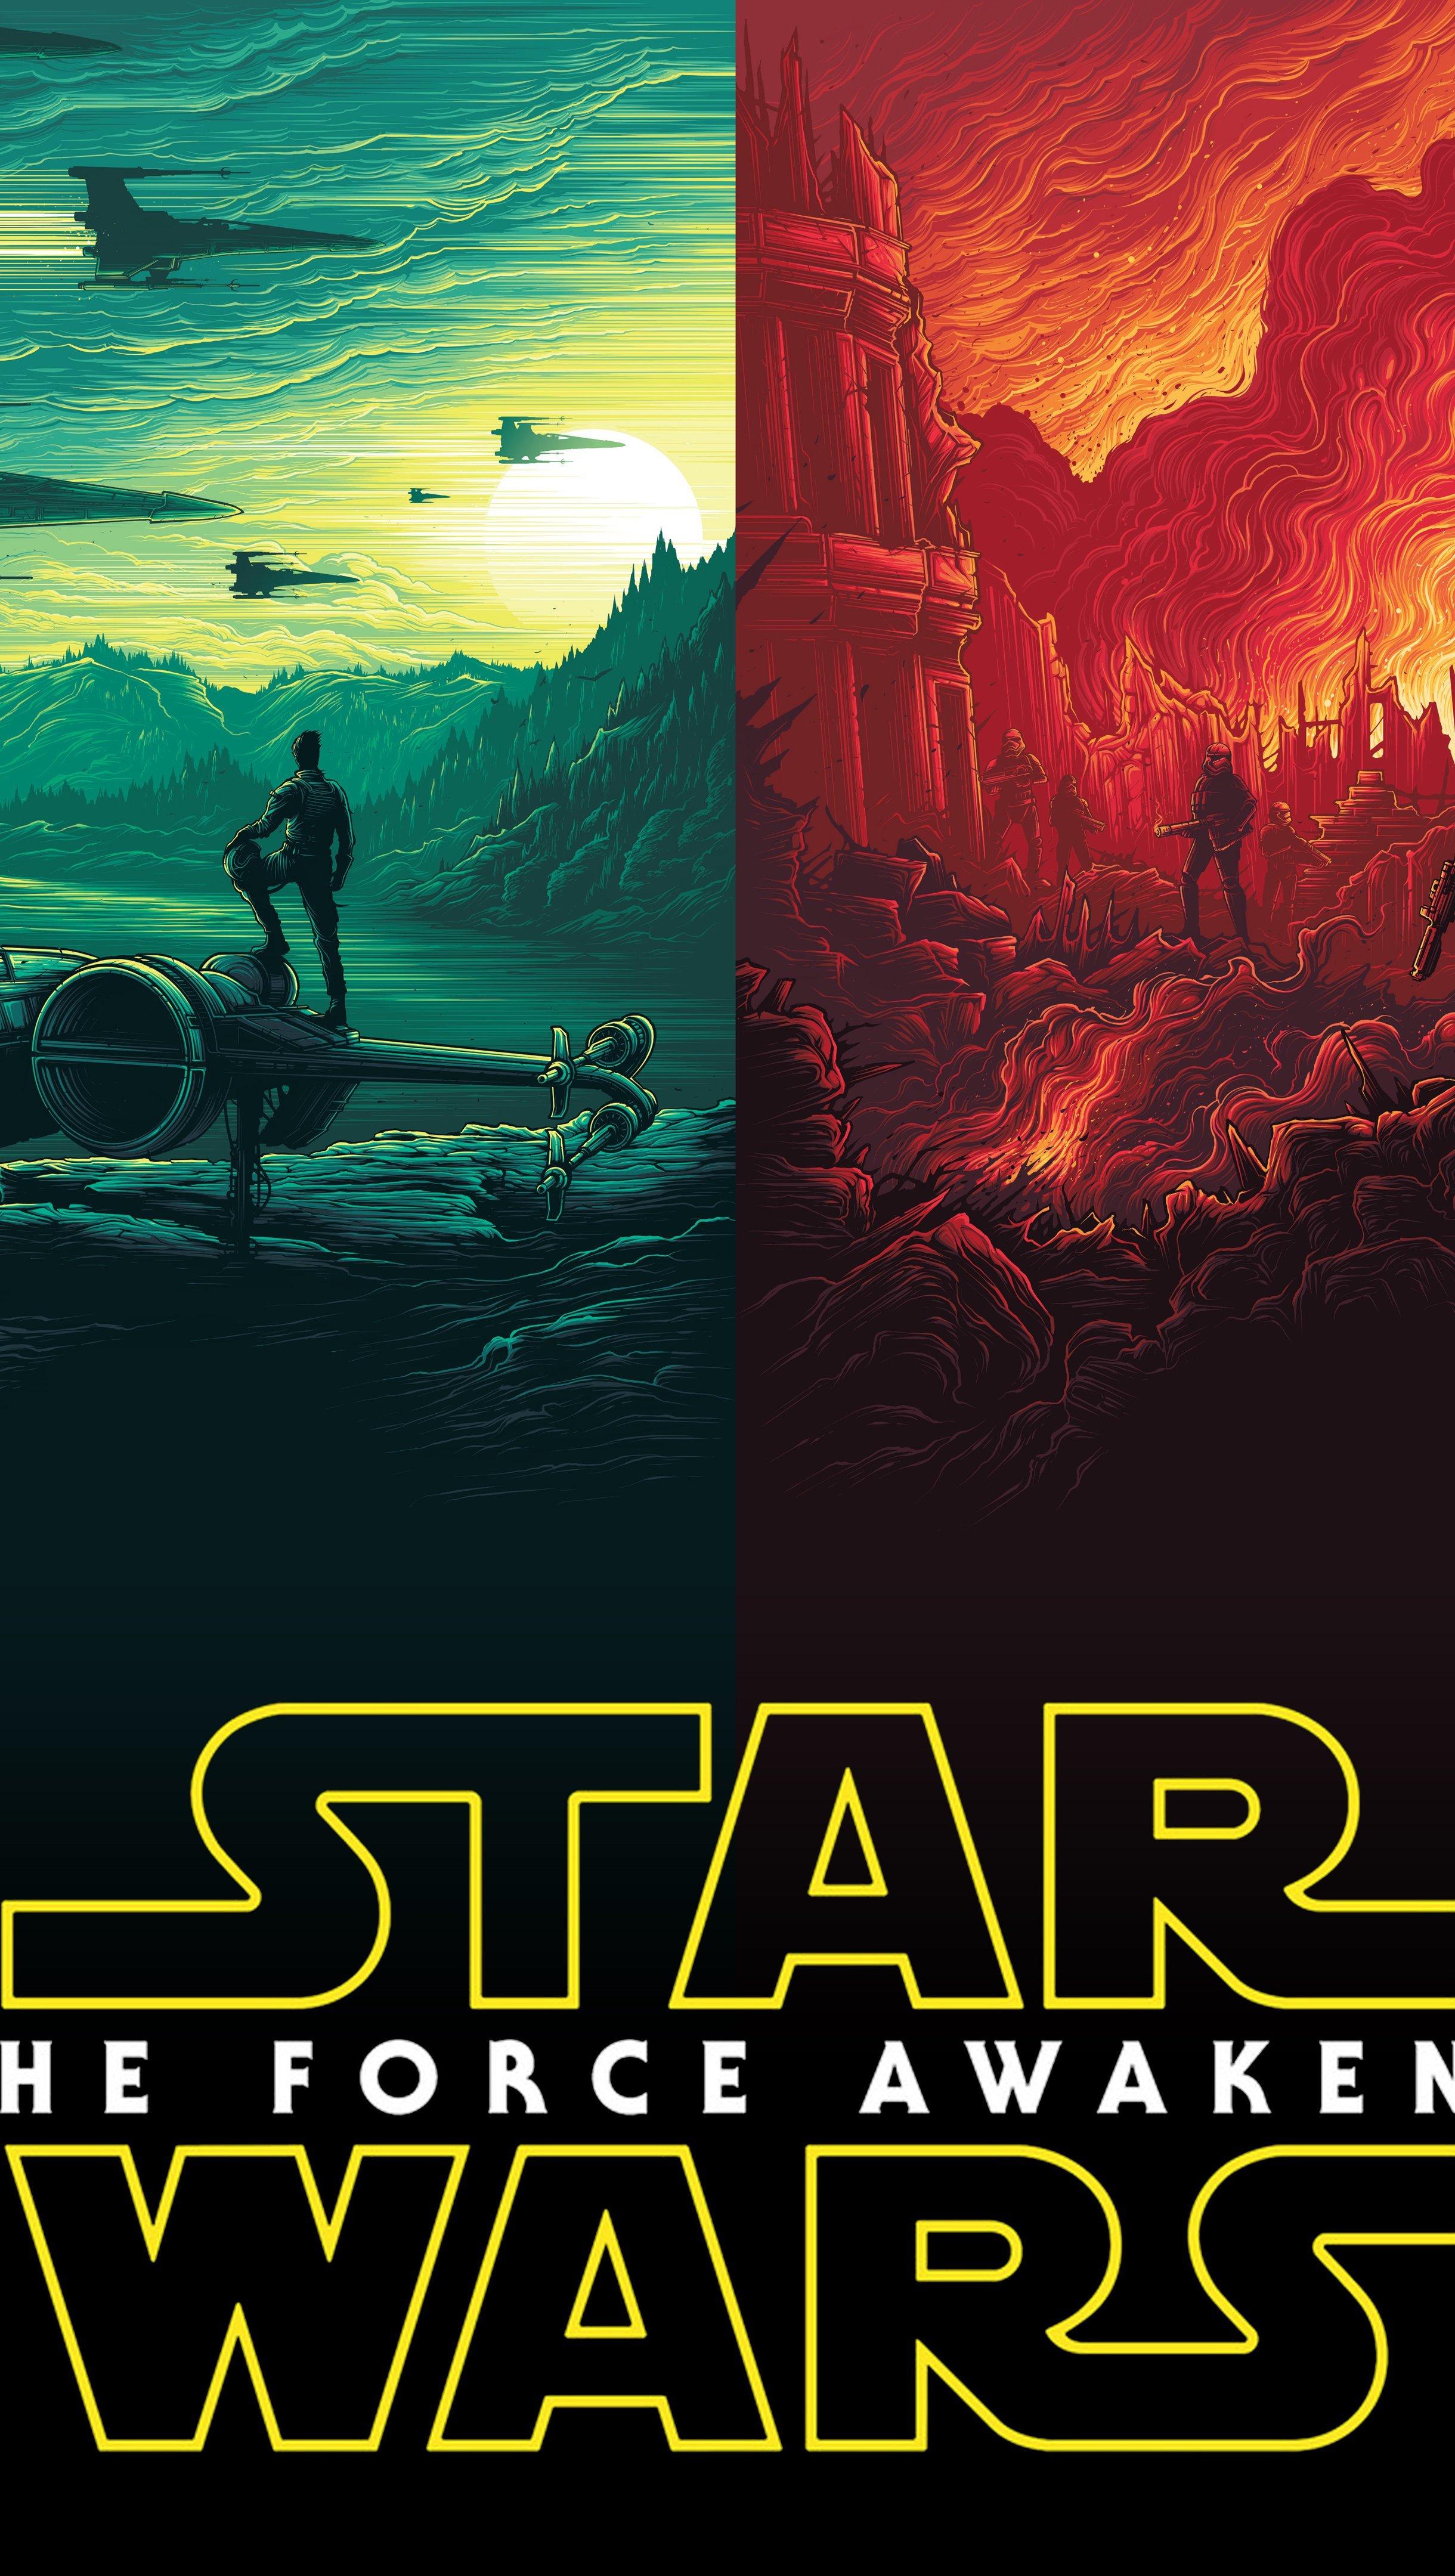 Fondos de pantalla Star Wars El despertar de la Fuerza Poster Logo Vertical